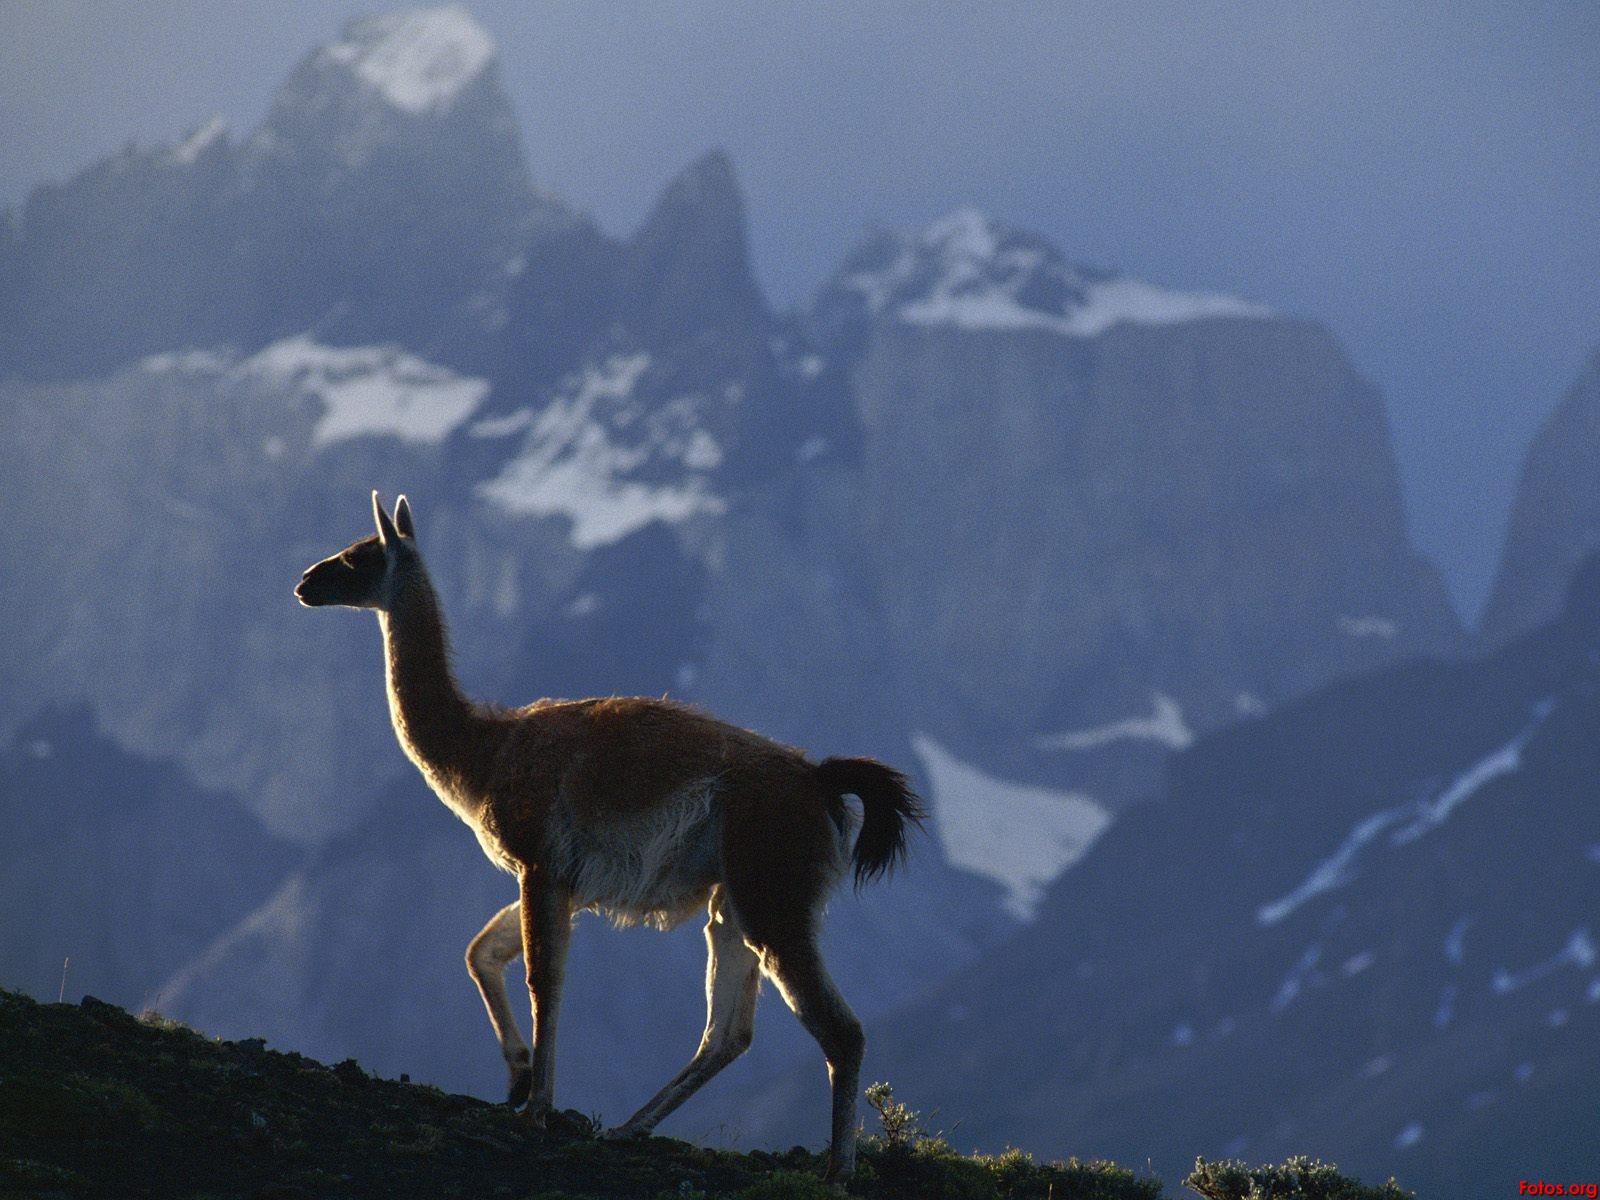 http://2.bp.blogspot.com/-amhuQcFDFvQ/UCaefsLZ8uI/AAAAAAAAEqA/u0j-SUDNYLE/s1600/Guanaco-Chile-wallpapers.jpg